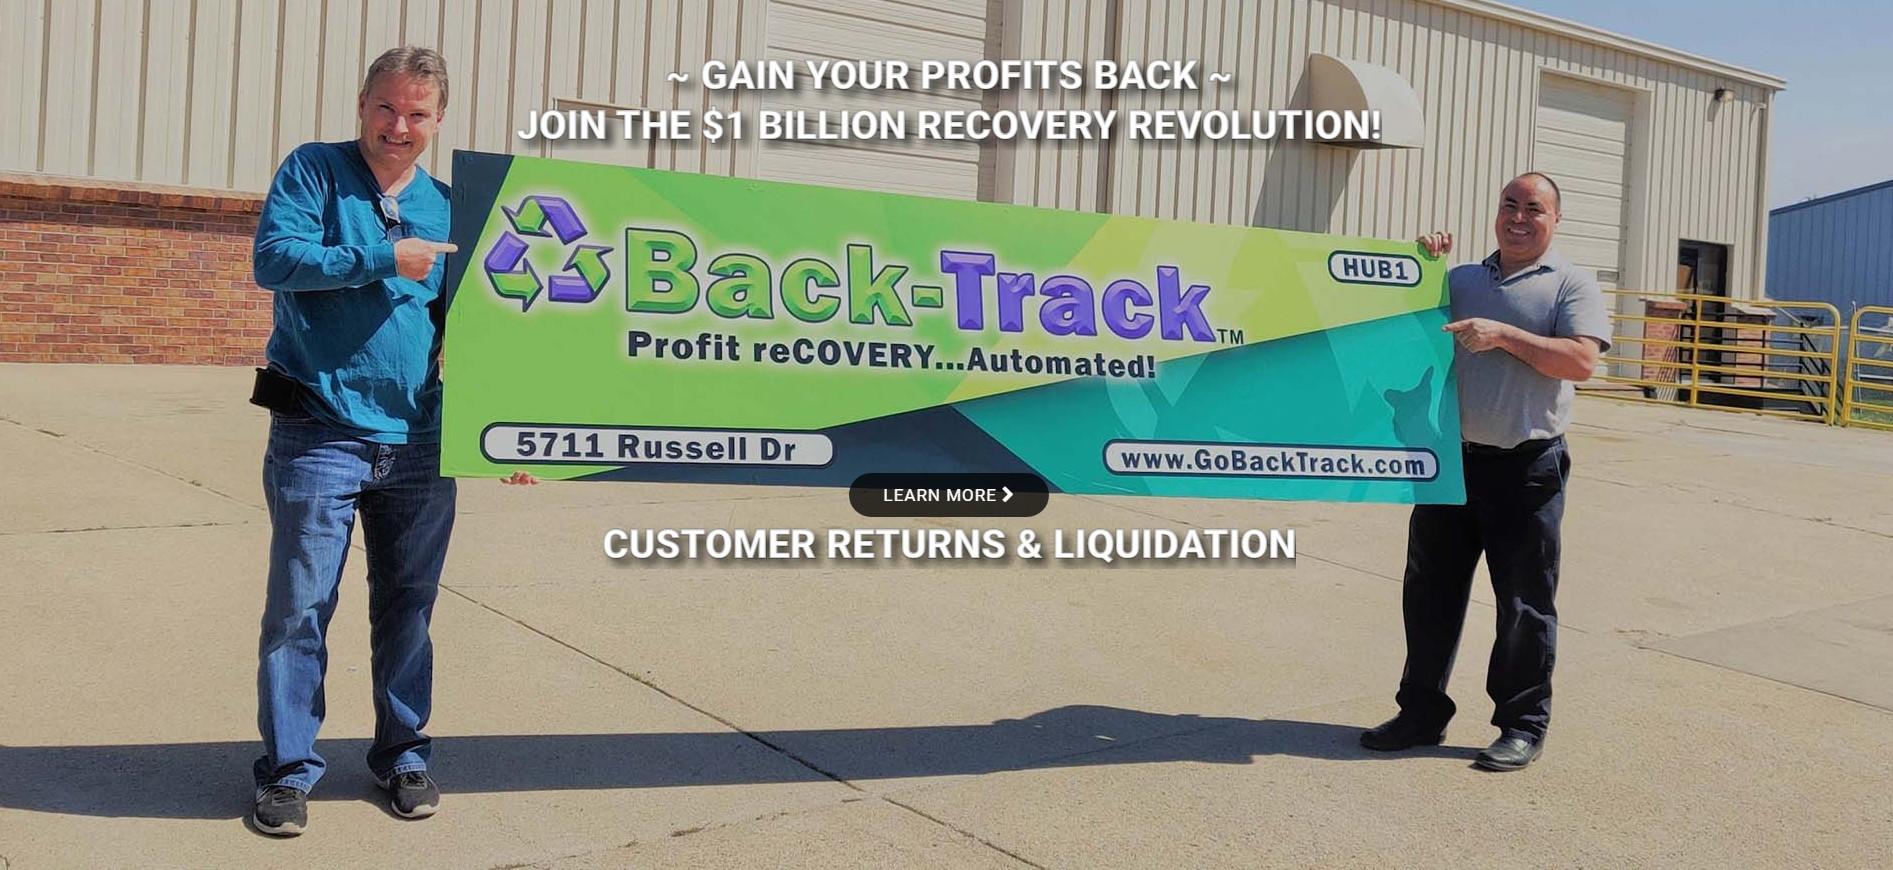 amazon customer returns management service